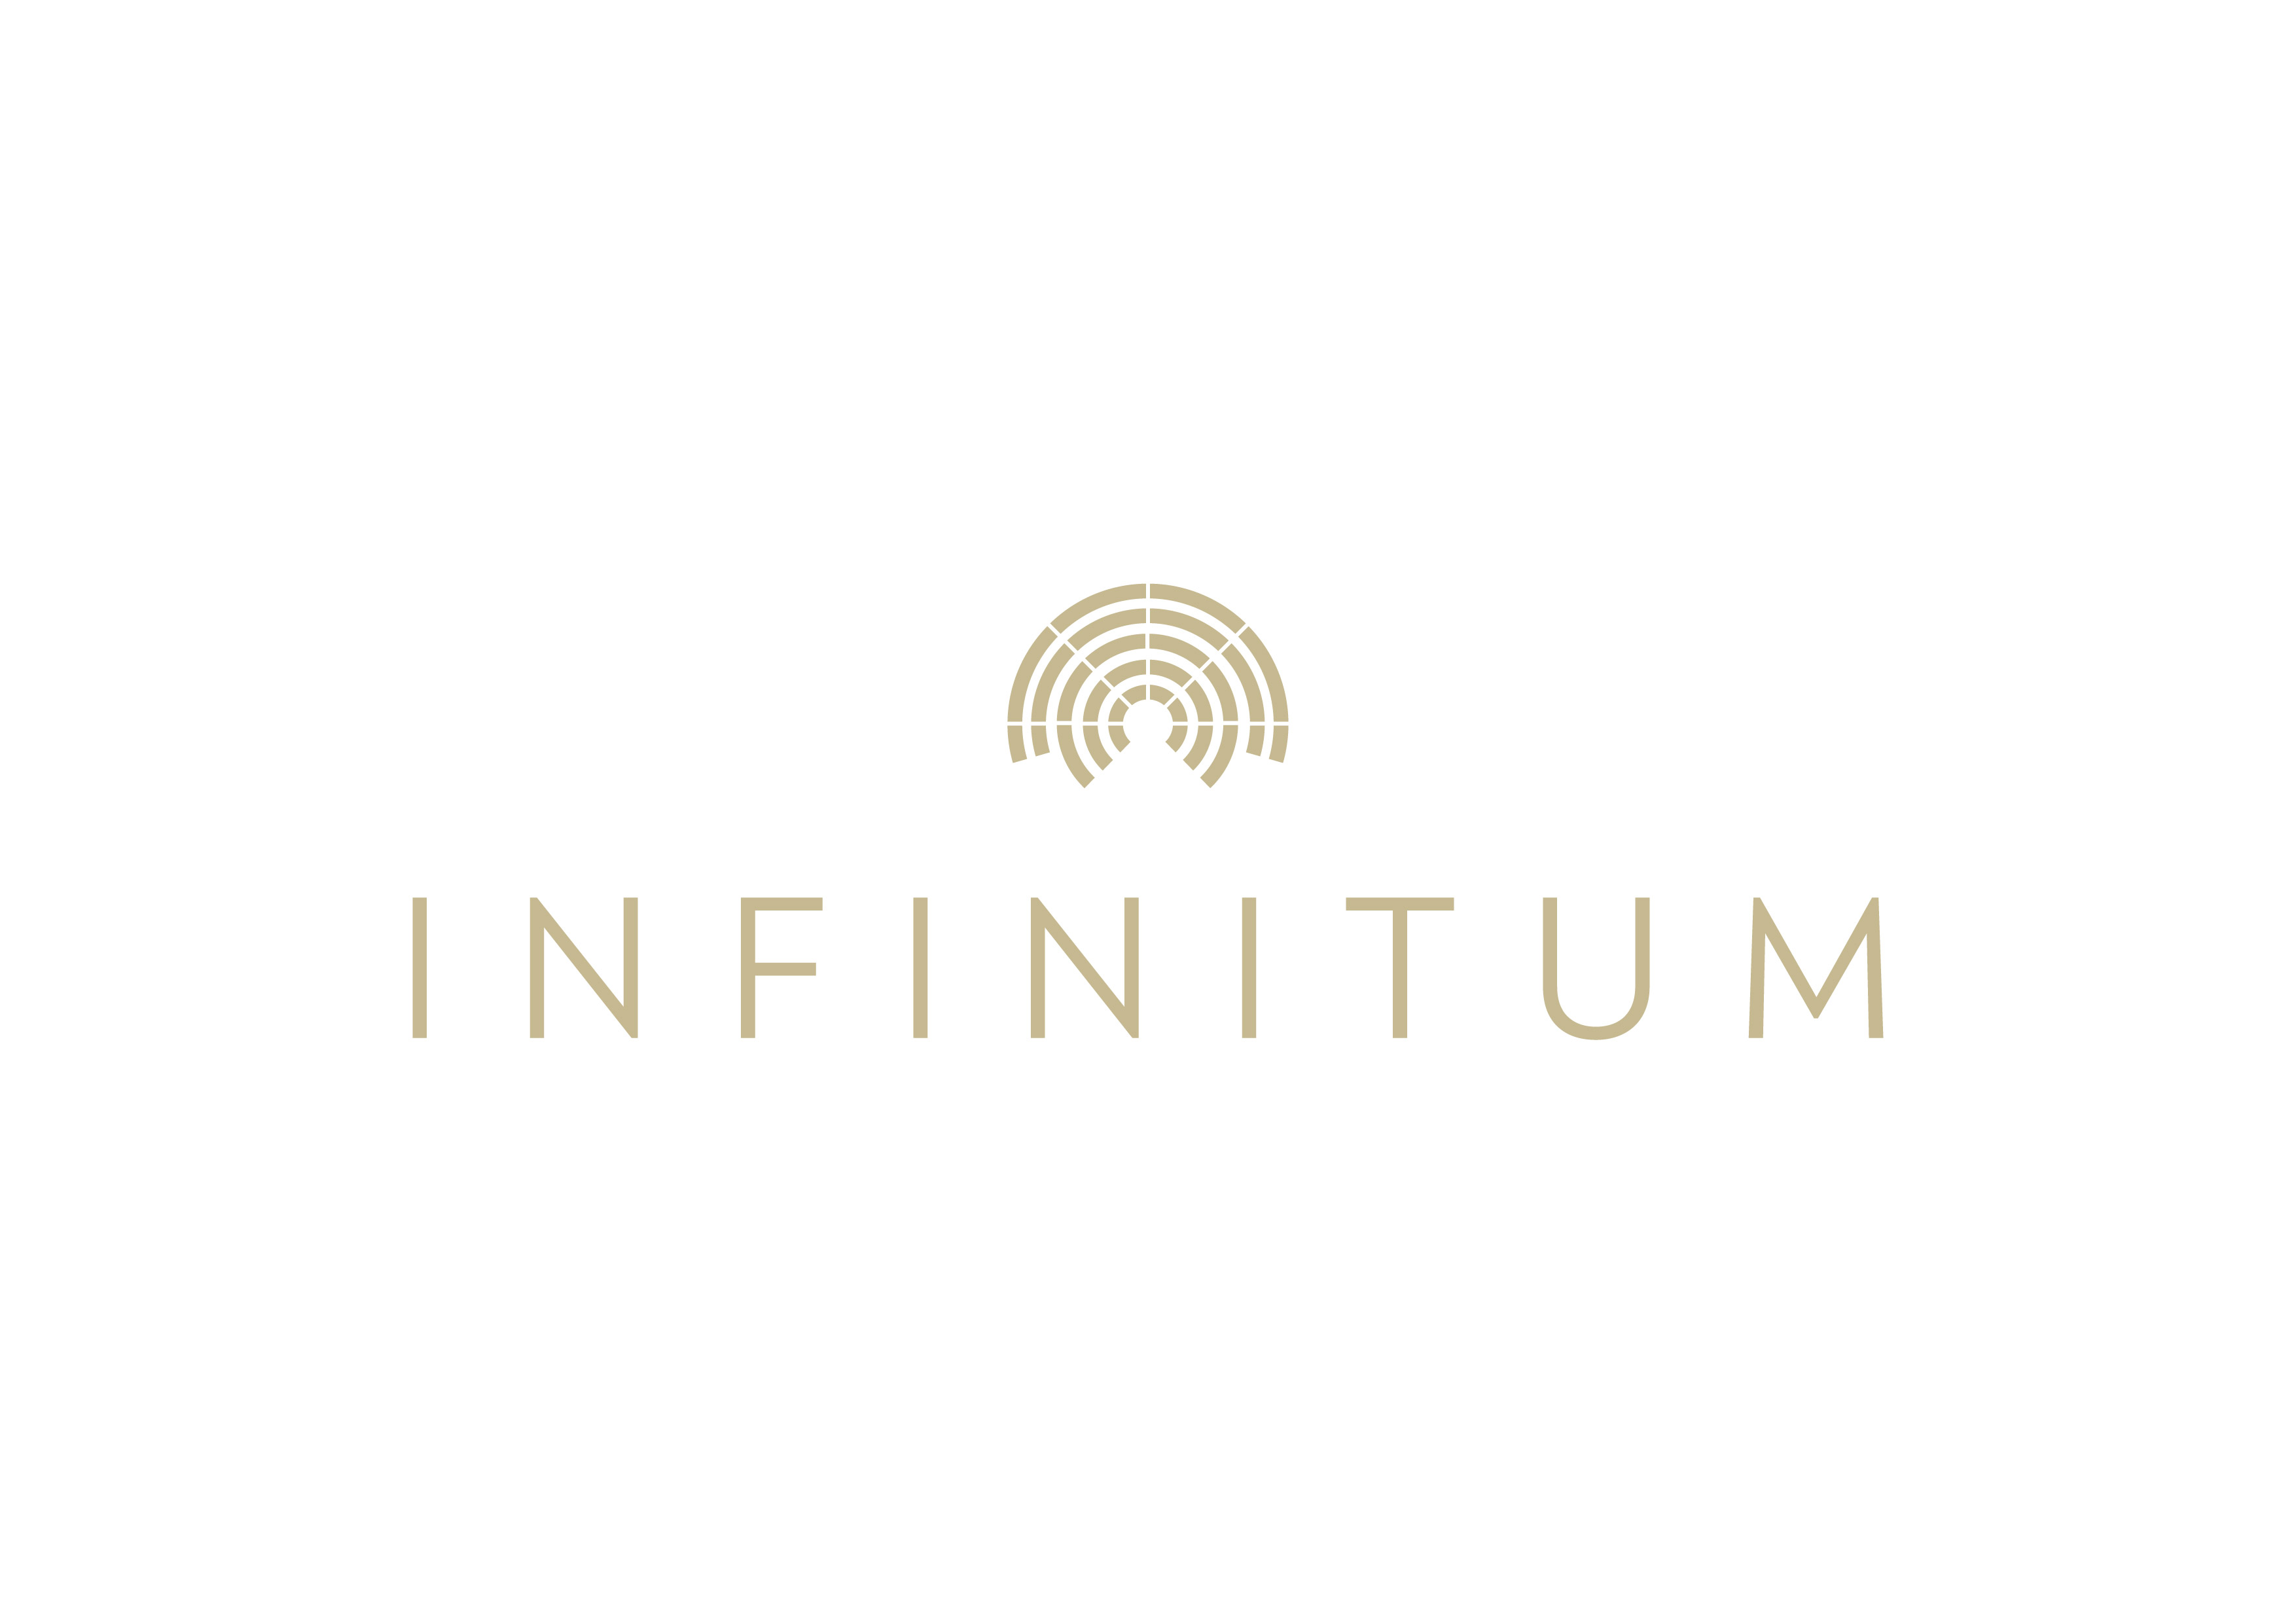 Infinitum - Costa Daurada